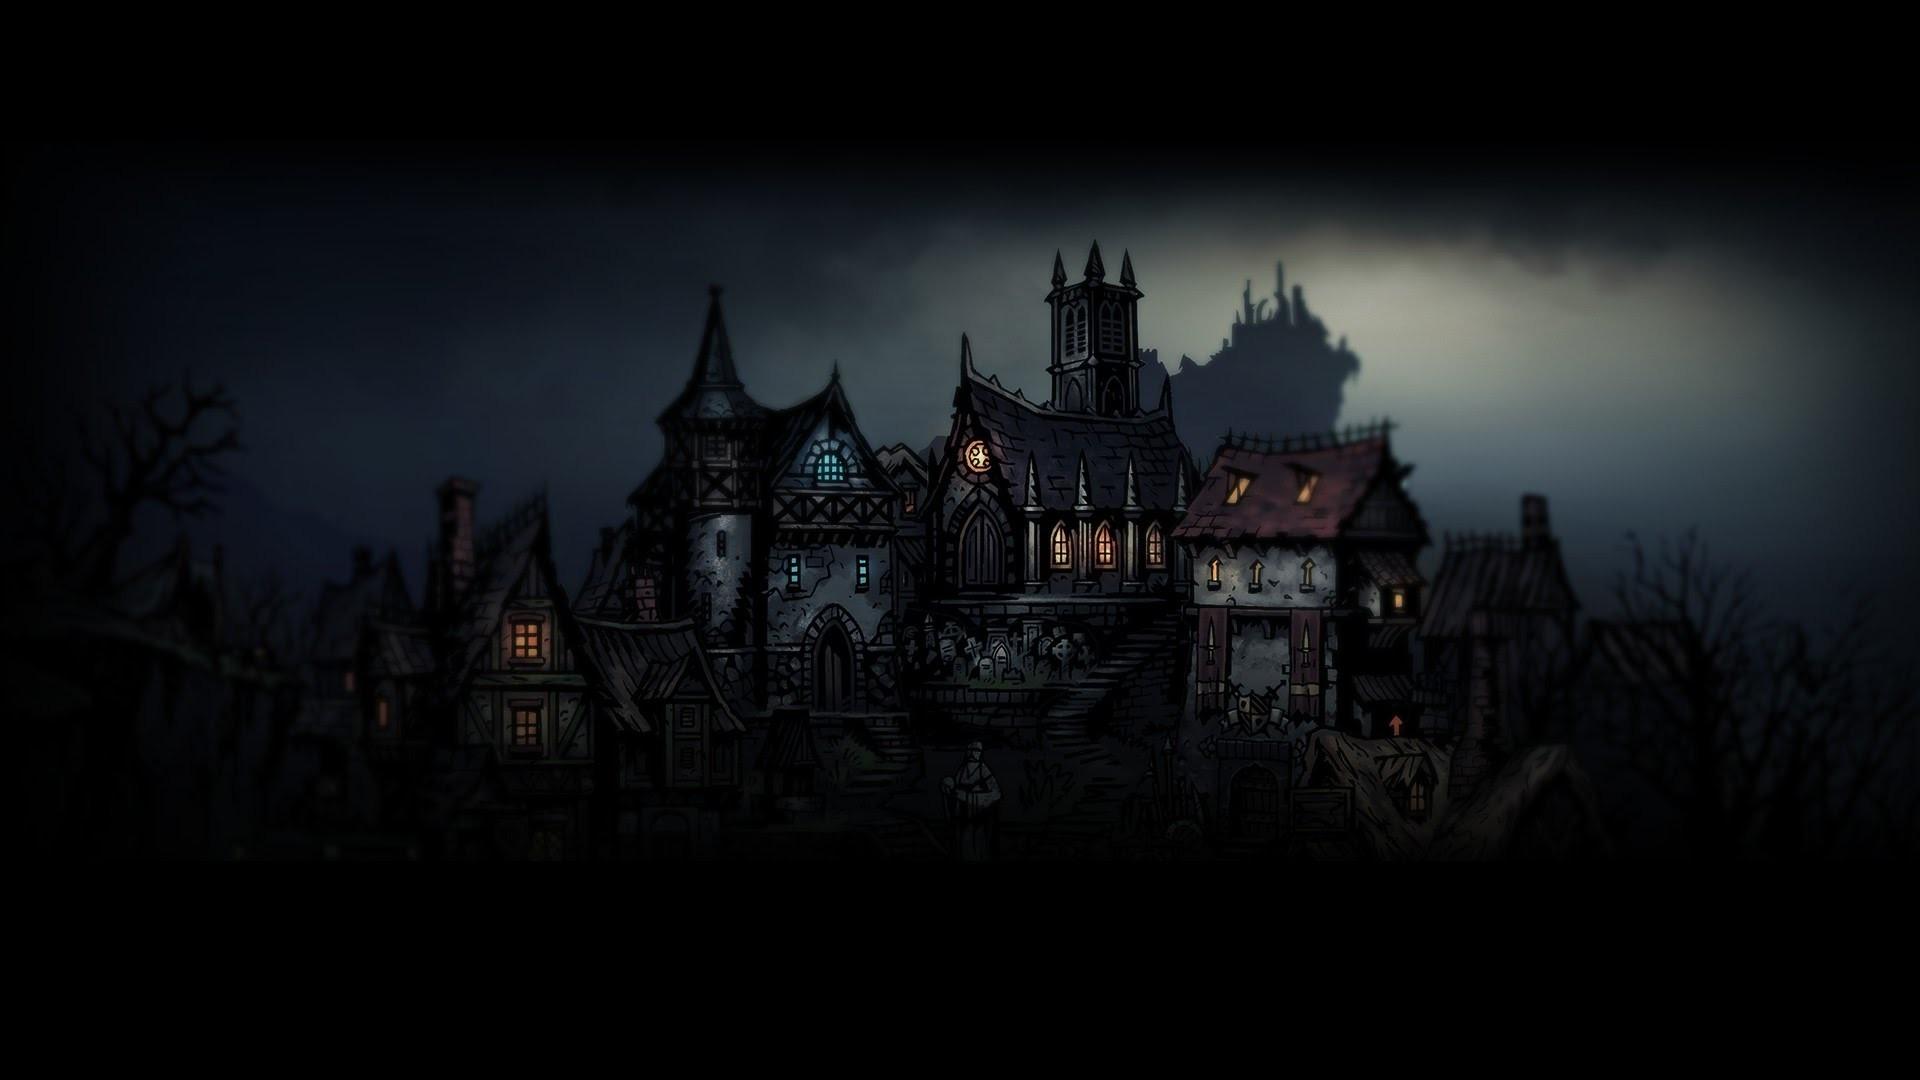 Amazing Wallpaper Night Evening - video-games-dark-night-evening-dusk-midnight-Darkest-Dungeon-light-darkness-screenshot-computer-wallpaper-103192  Trends-38774.jpg